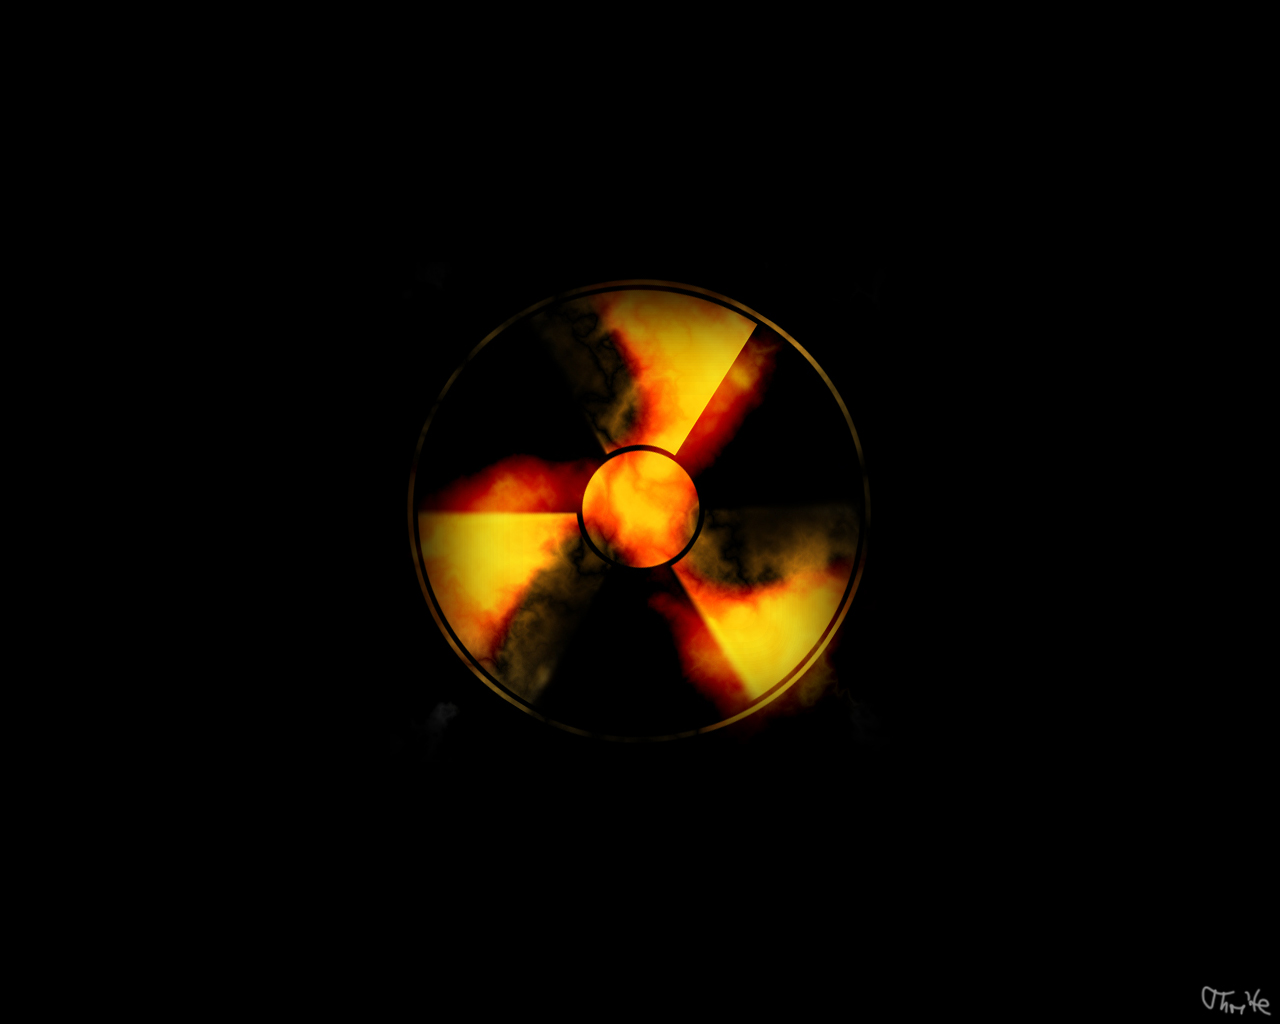 Nuke Wallpaper 1280x1024